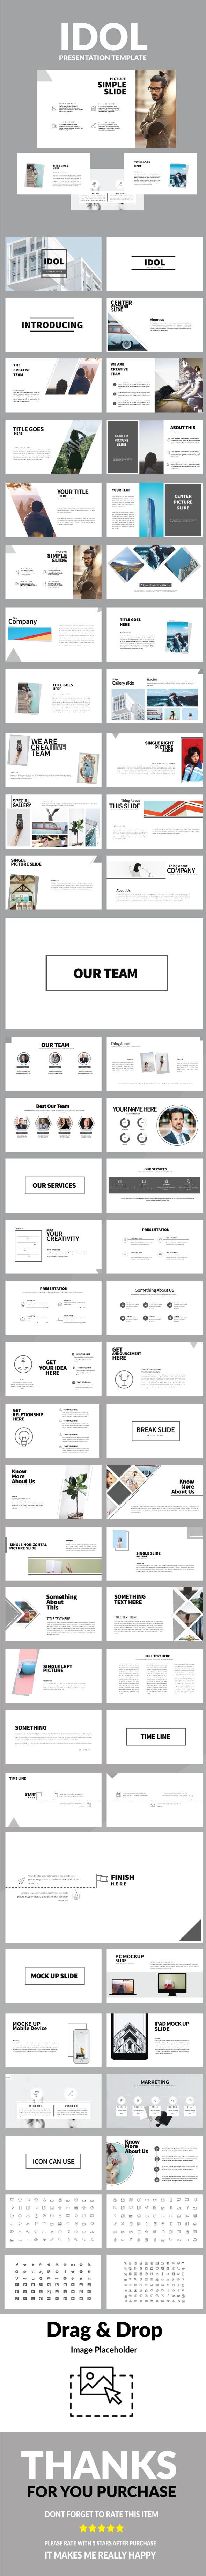 Idol Multipurpose Powerpoint - PowerPoint Templates Presentation Templates